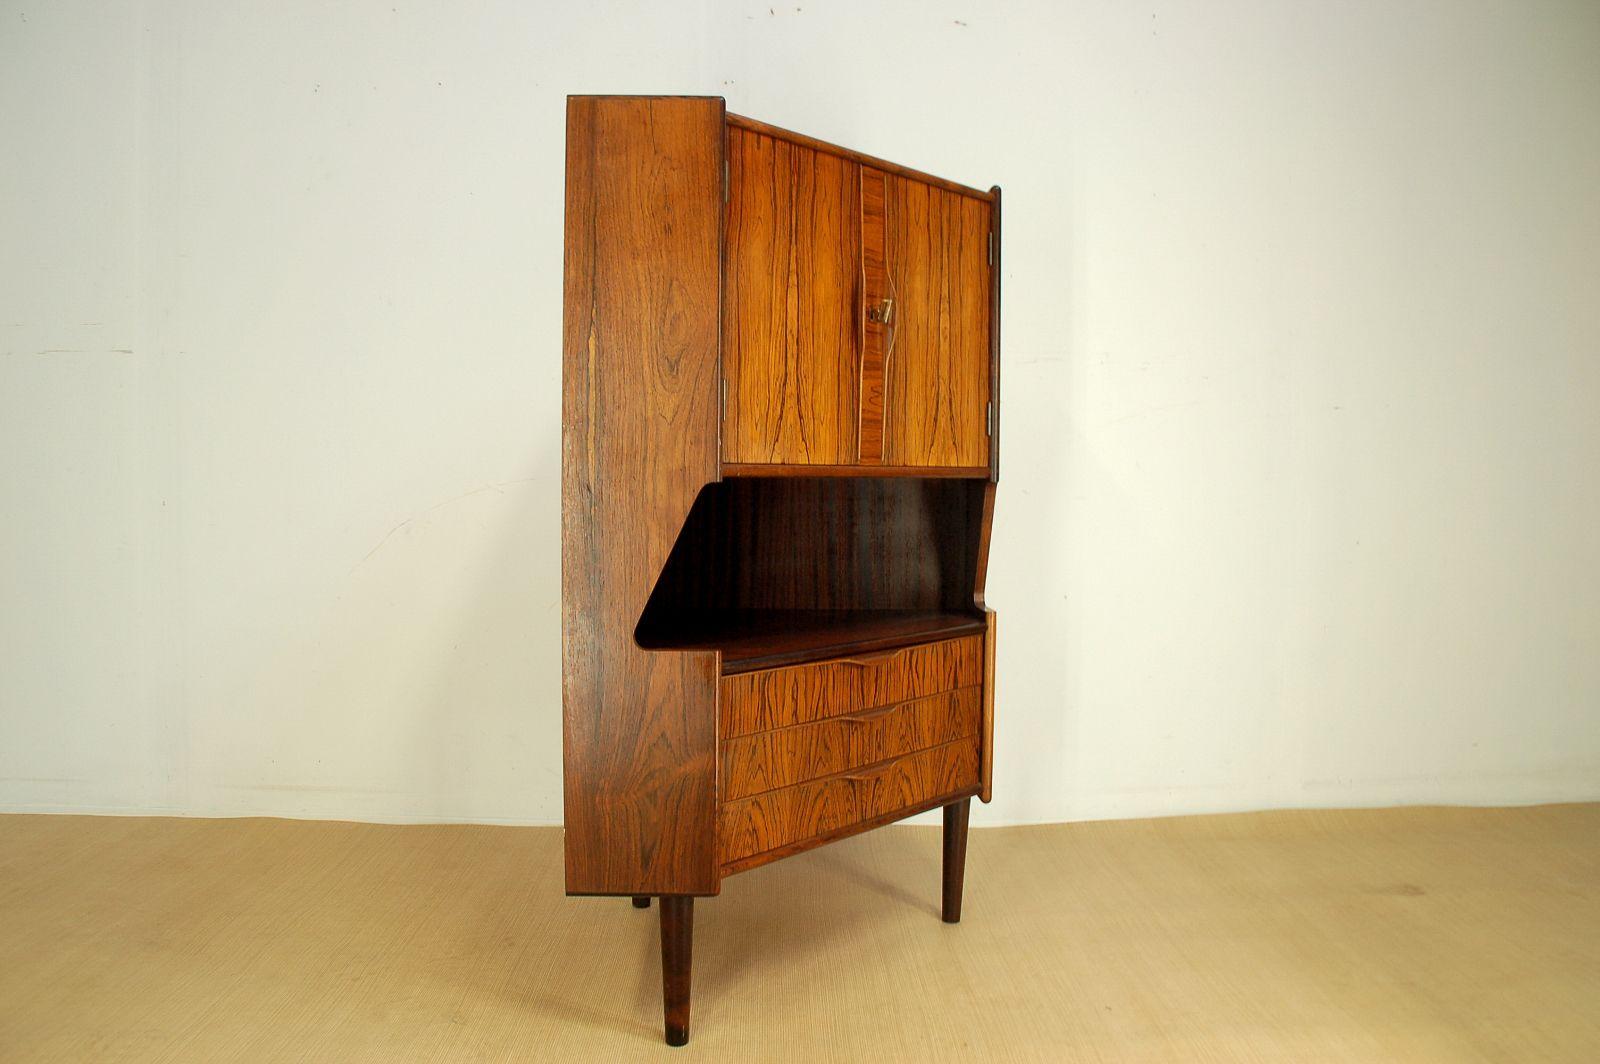 Mid Century Corner Cabinet: Mid-Century Rosewood Corner Bar Cabinet, 1960s For Sale At